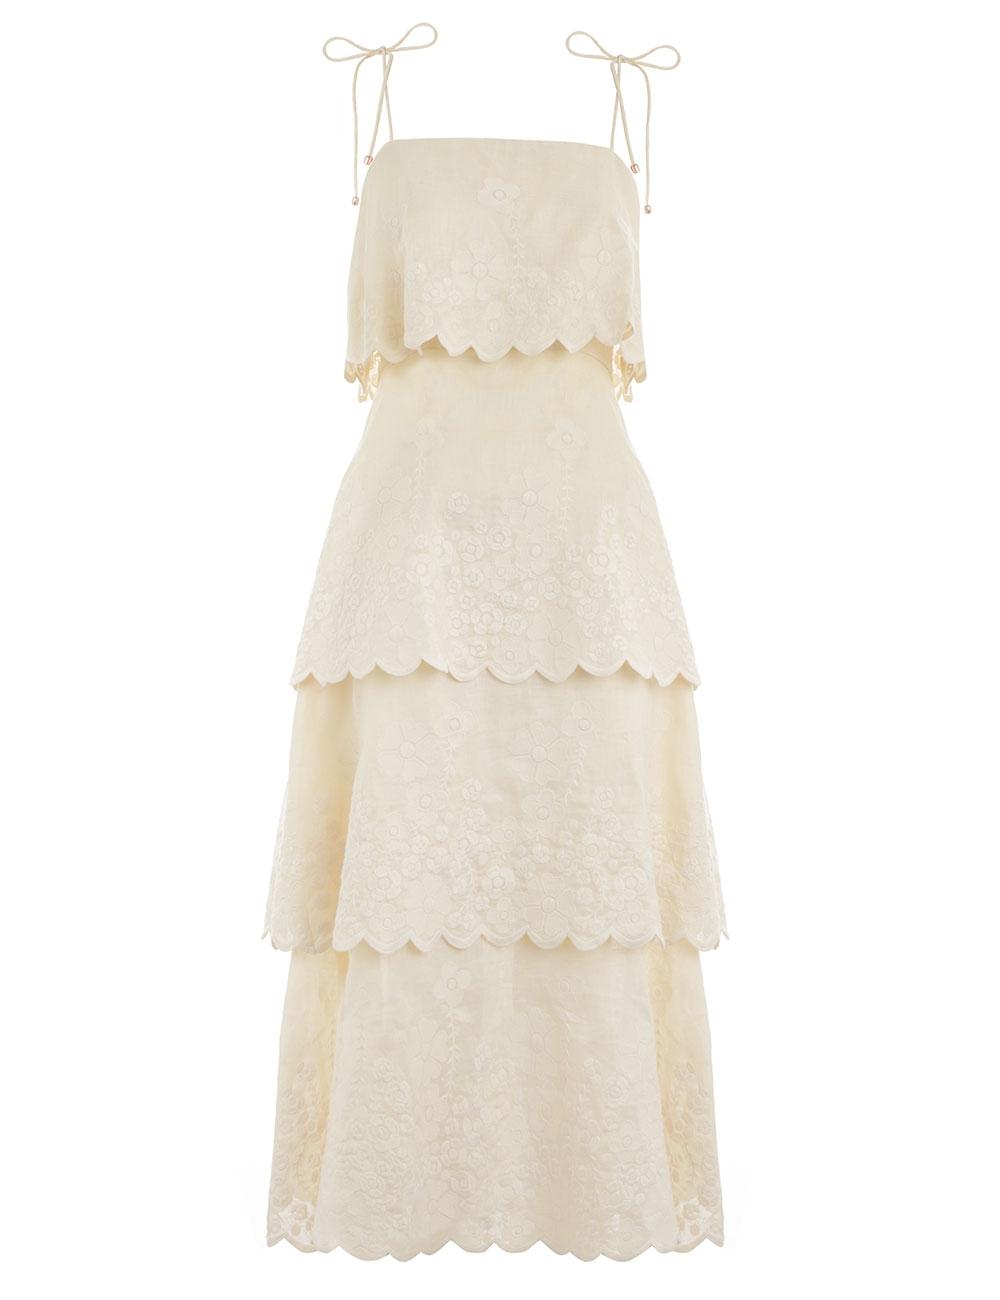 Primrose Embroidered Dress